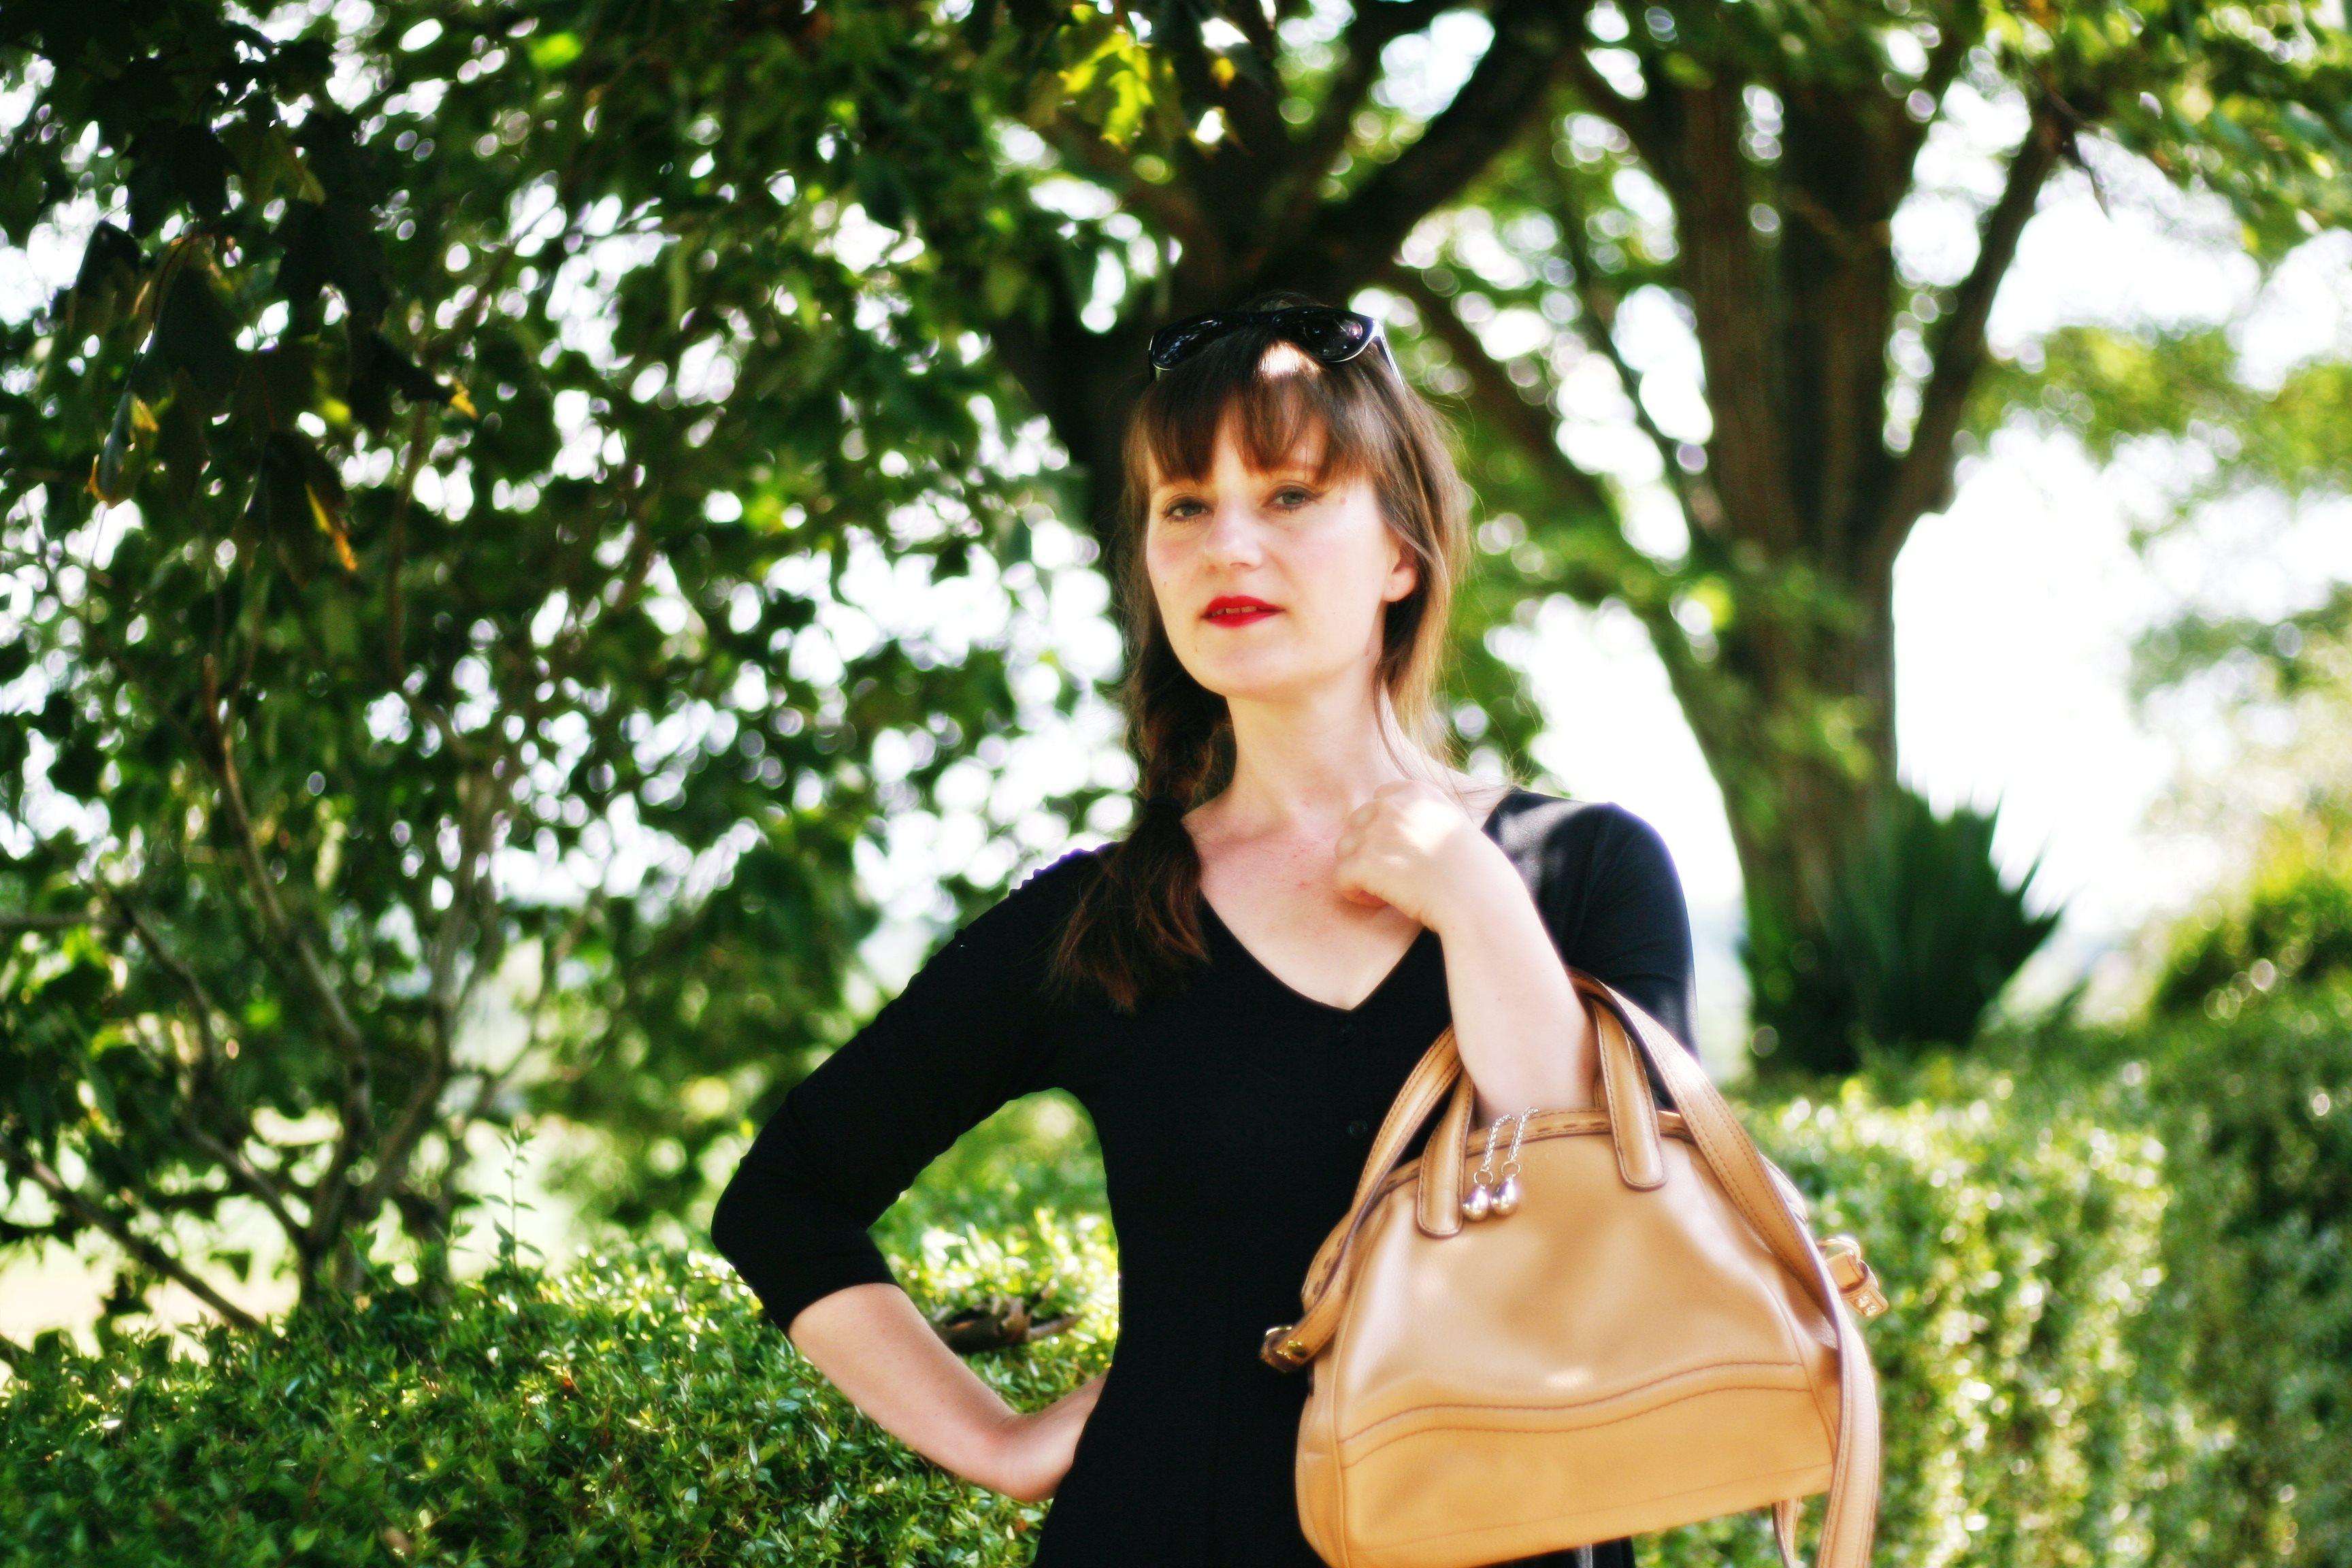 robe noire style 90 boutonnée blog mode